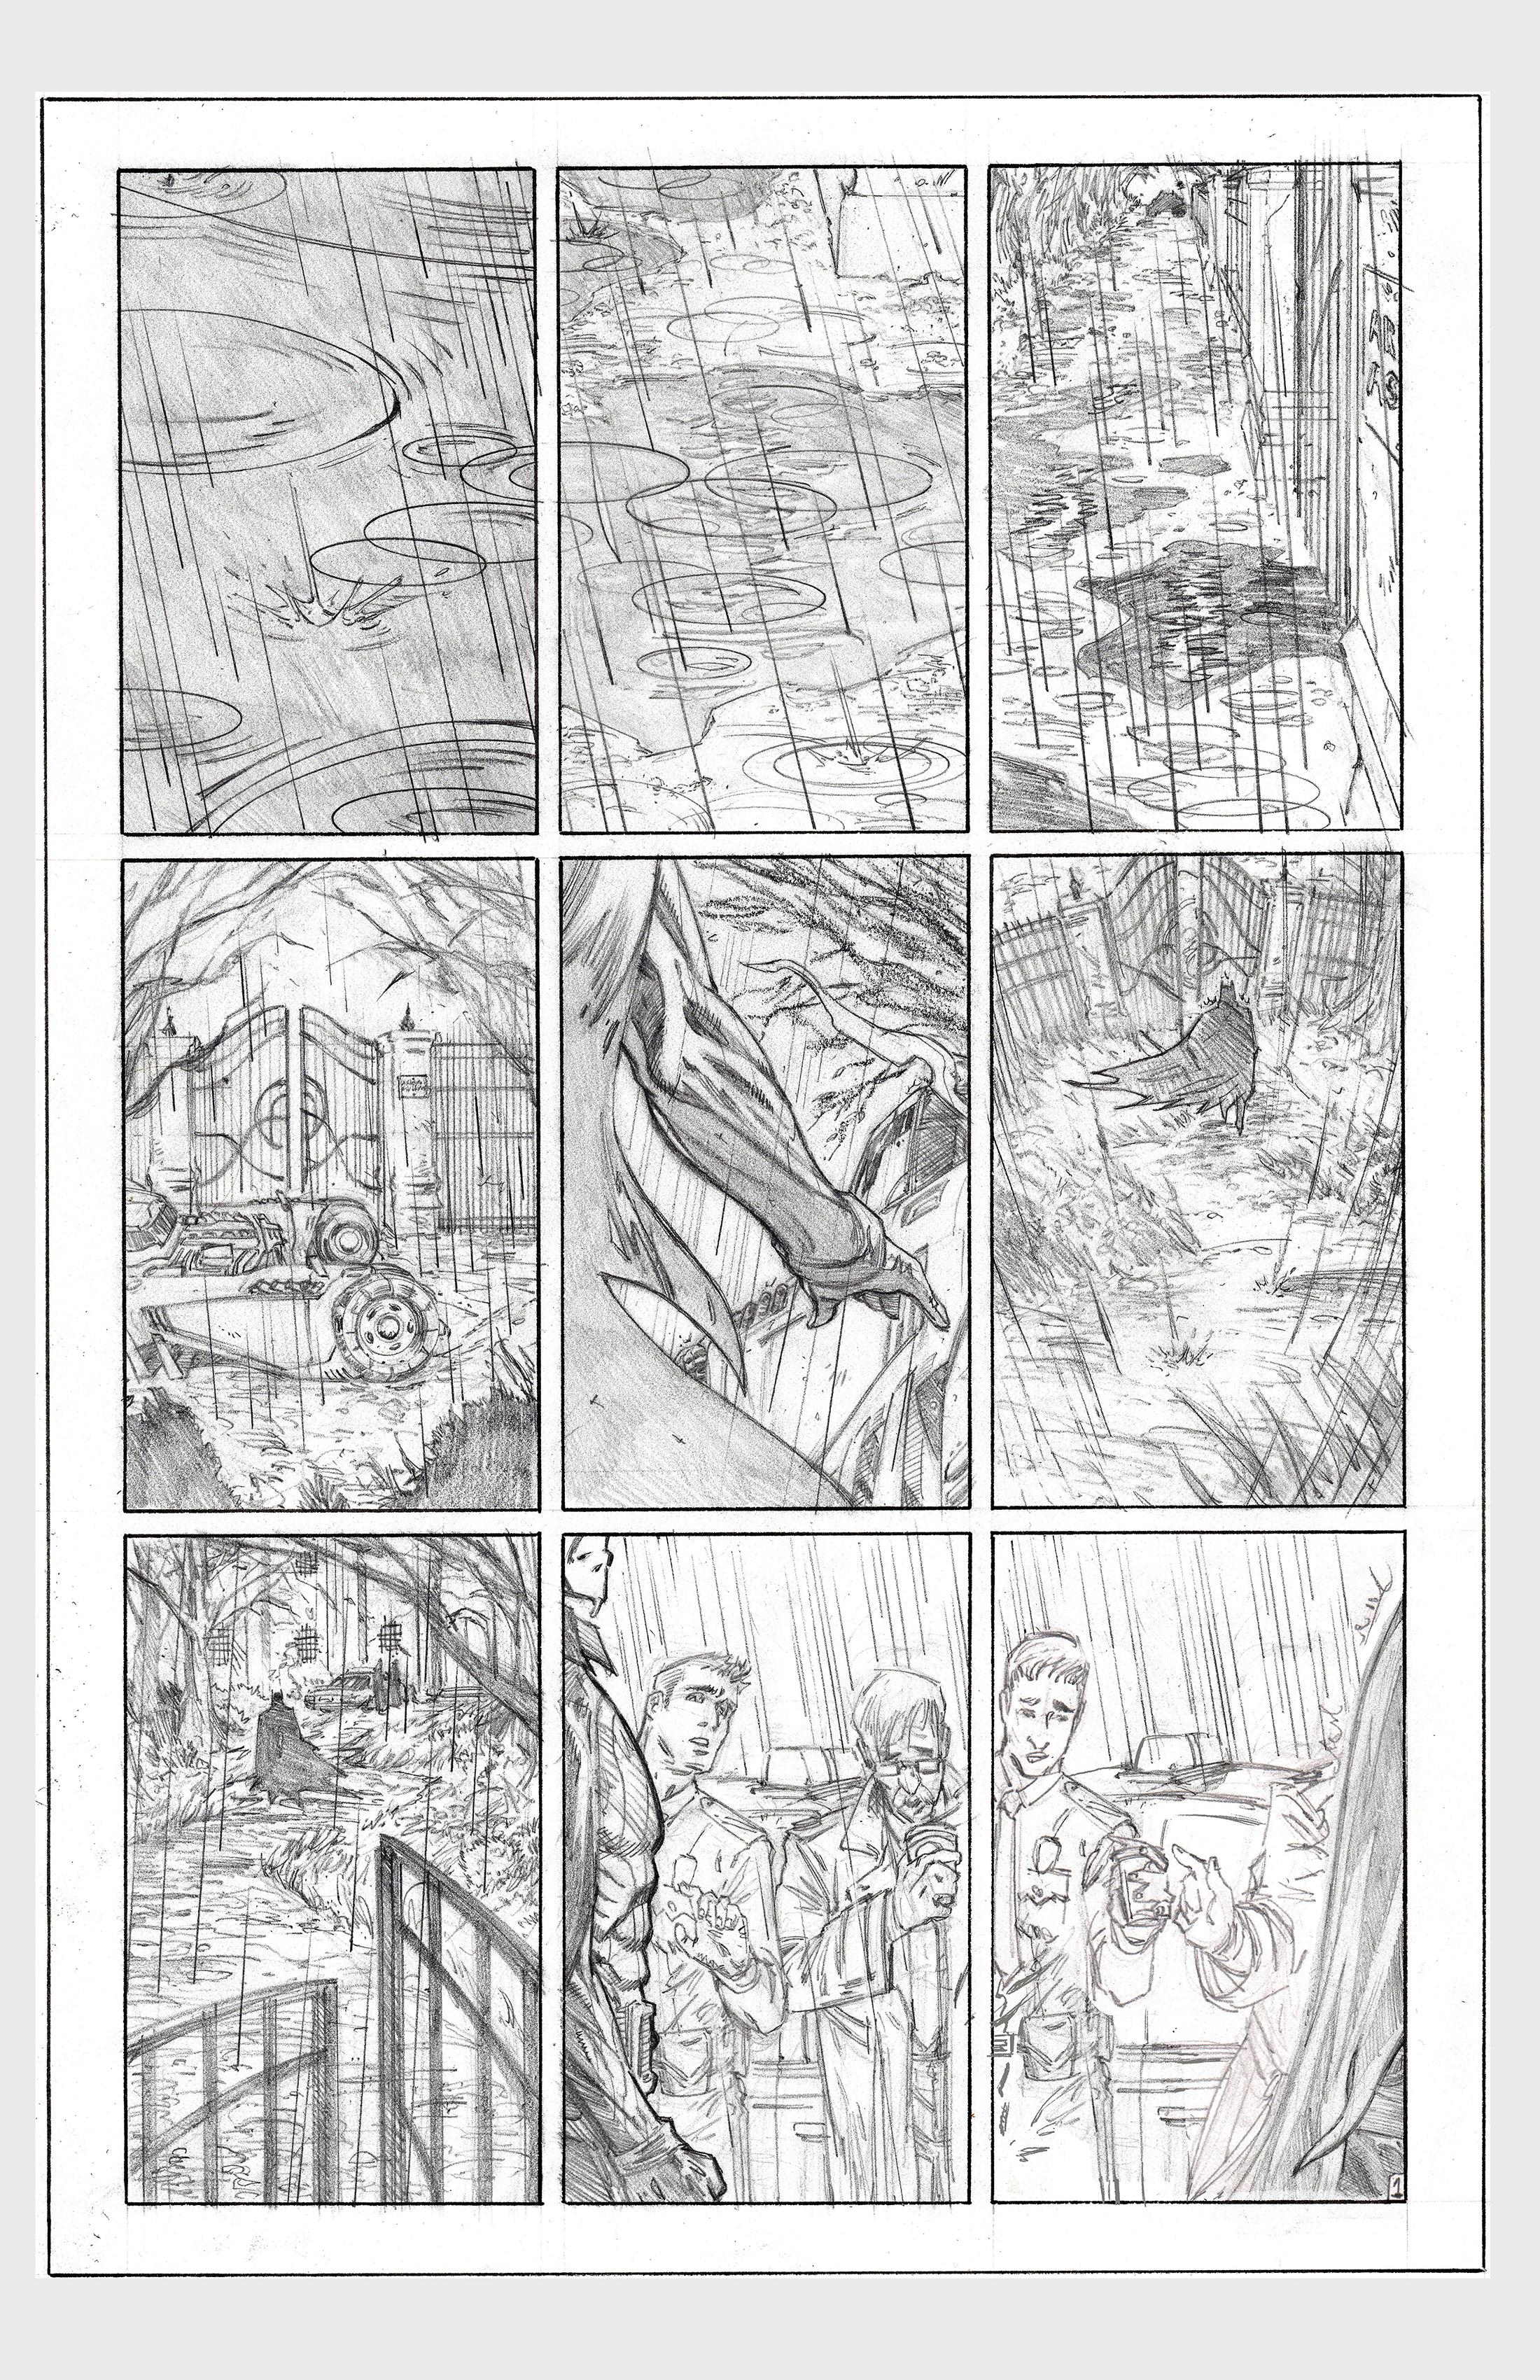 The Killing Joke DC Sample page 1 pencils